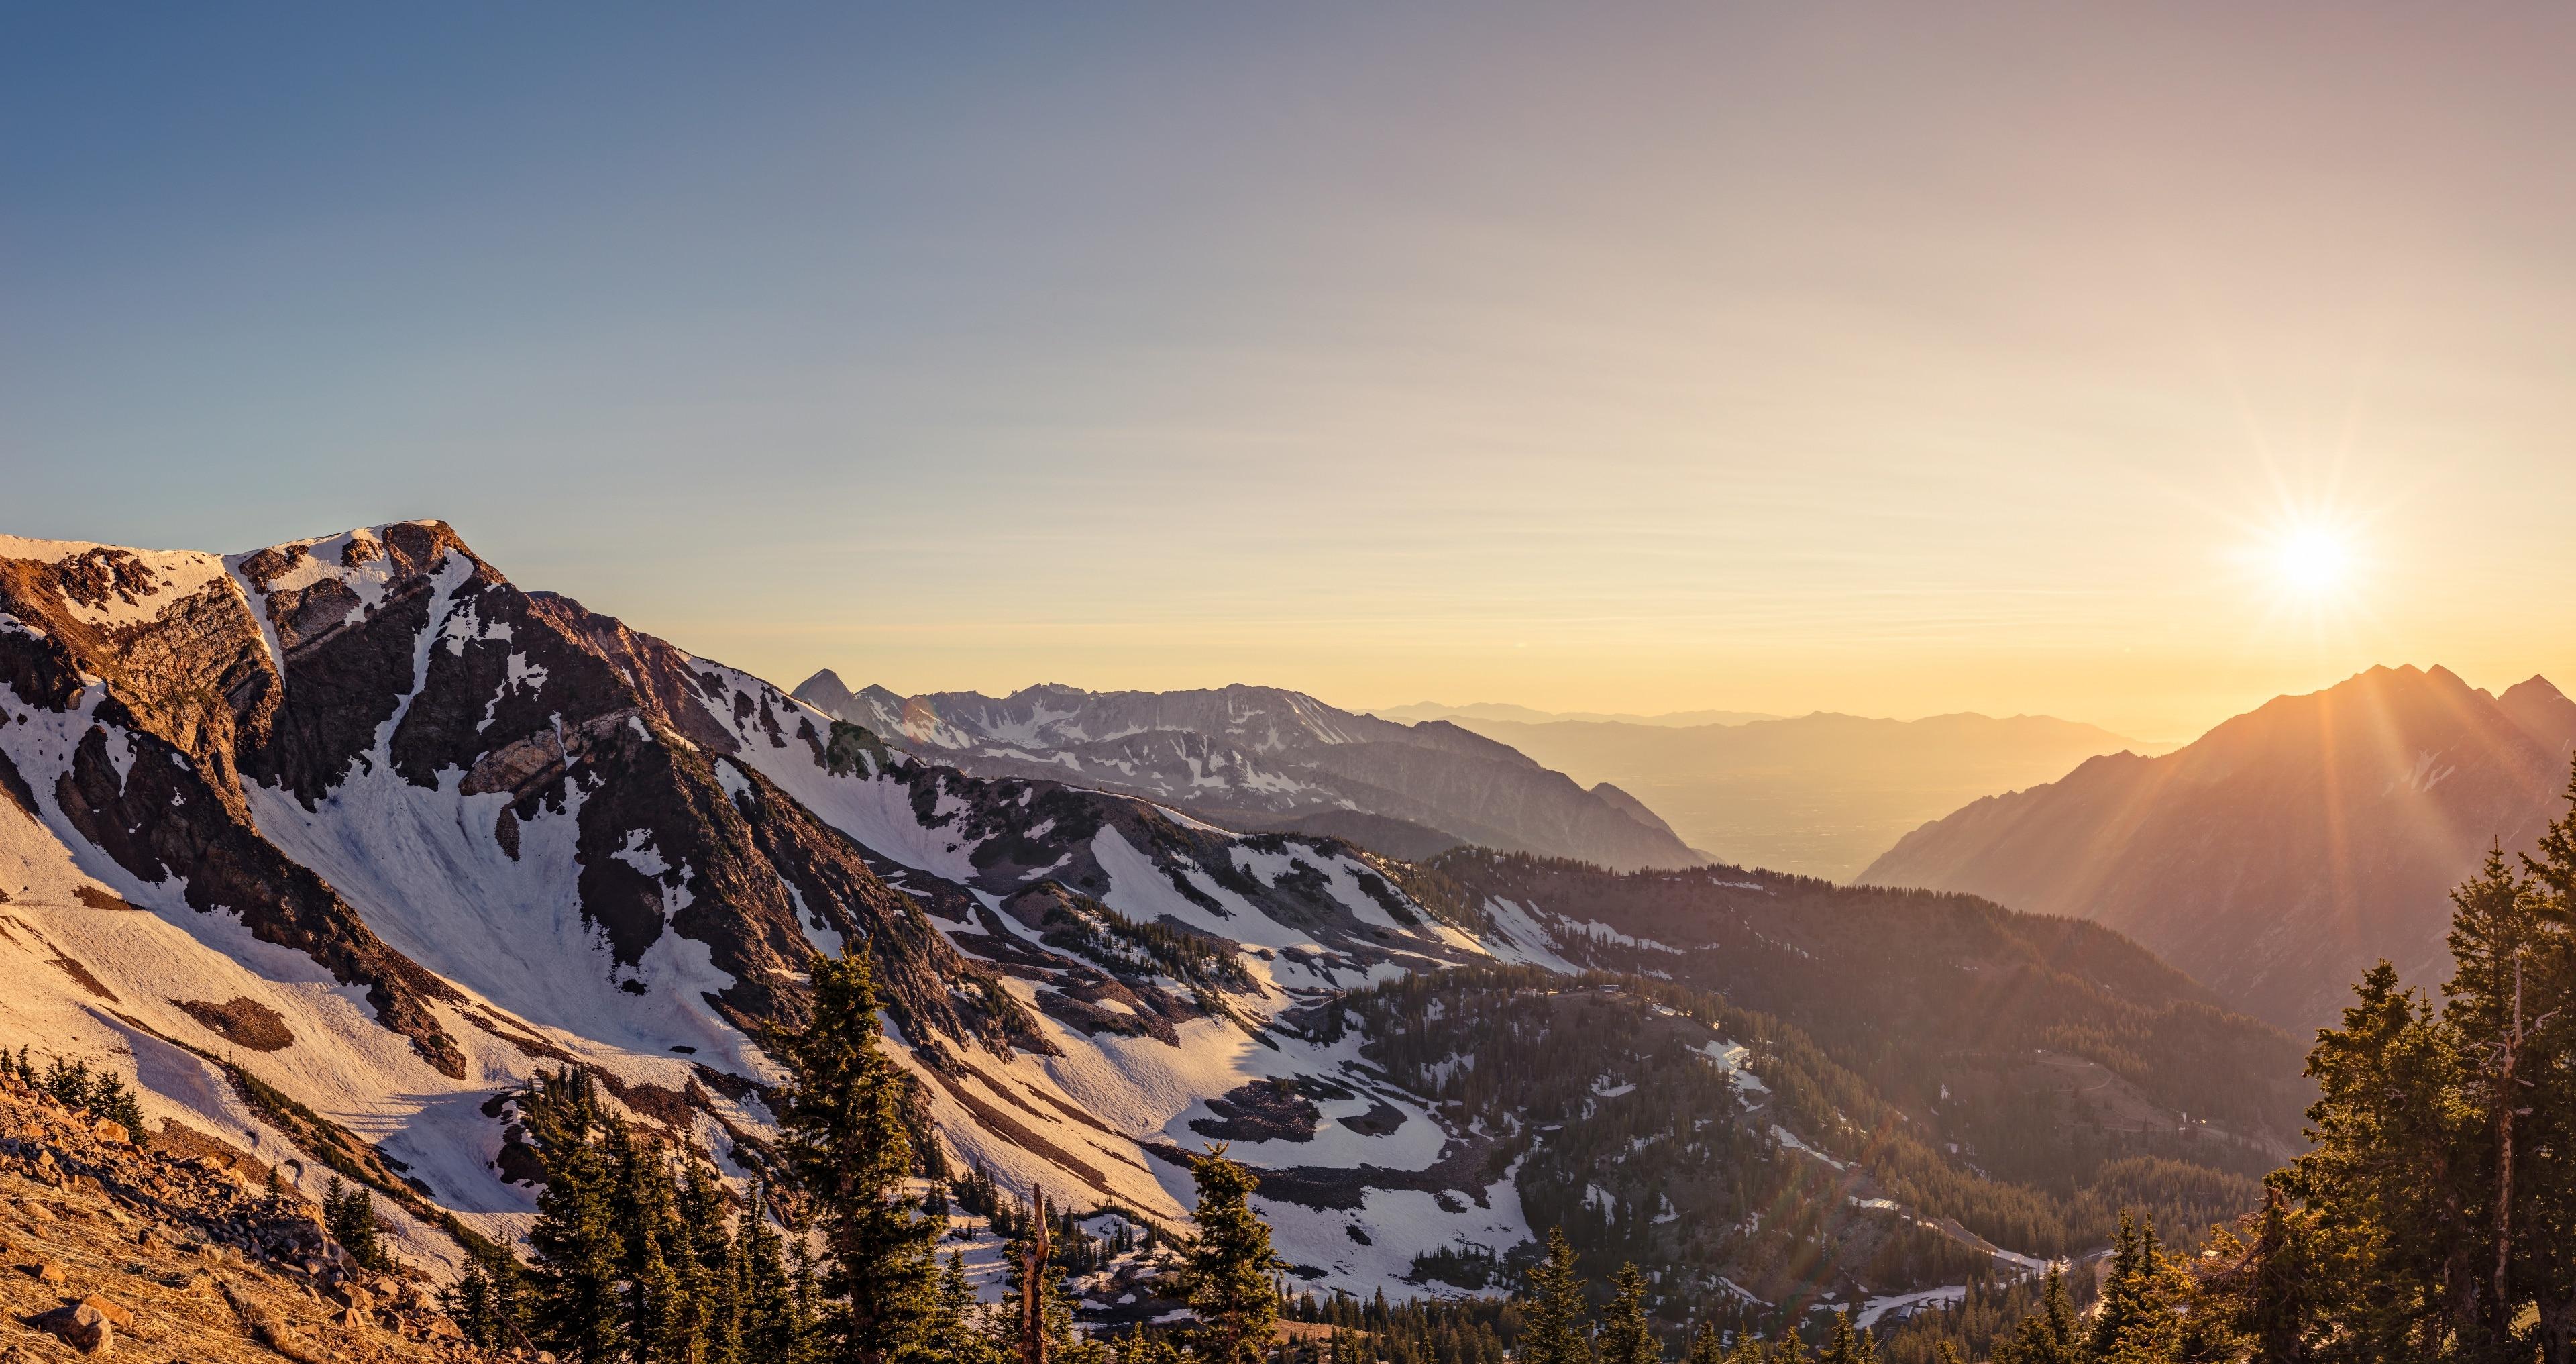 Snowbird Ski Resort, Sandy, Utah, United States of America